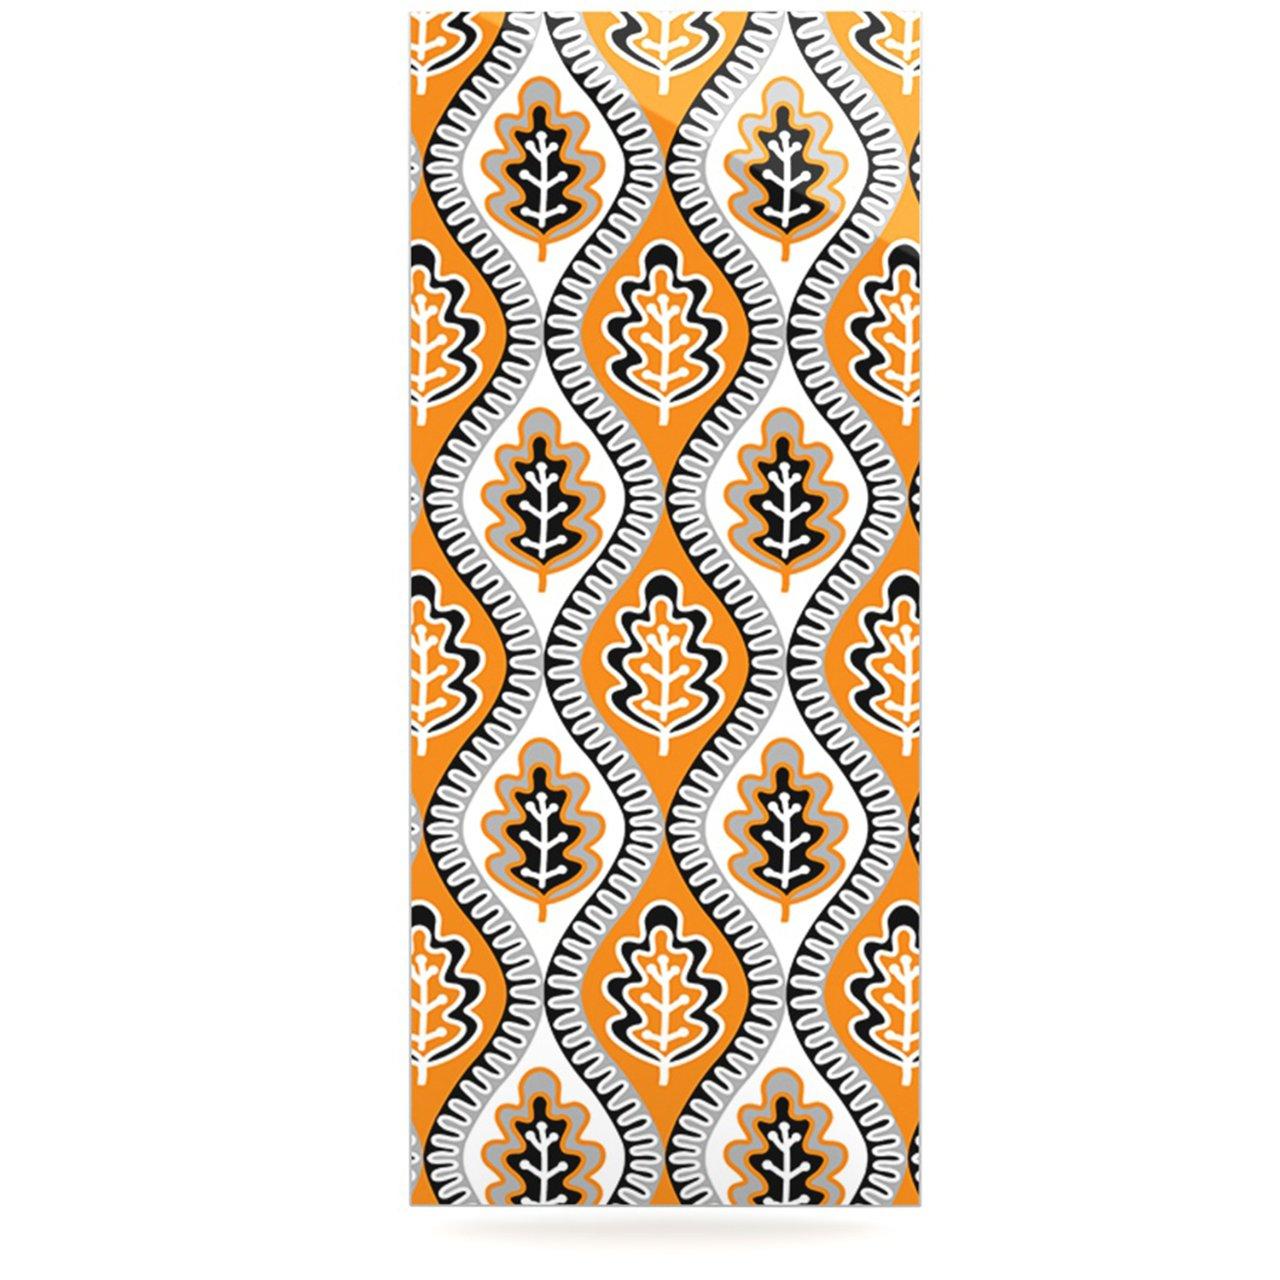 Kess InHouse Jacqueline Milton Oak Leaf Floral Orange Luxe Rectangle Panel 24 x 36